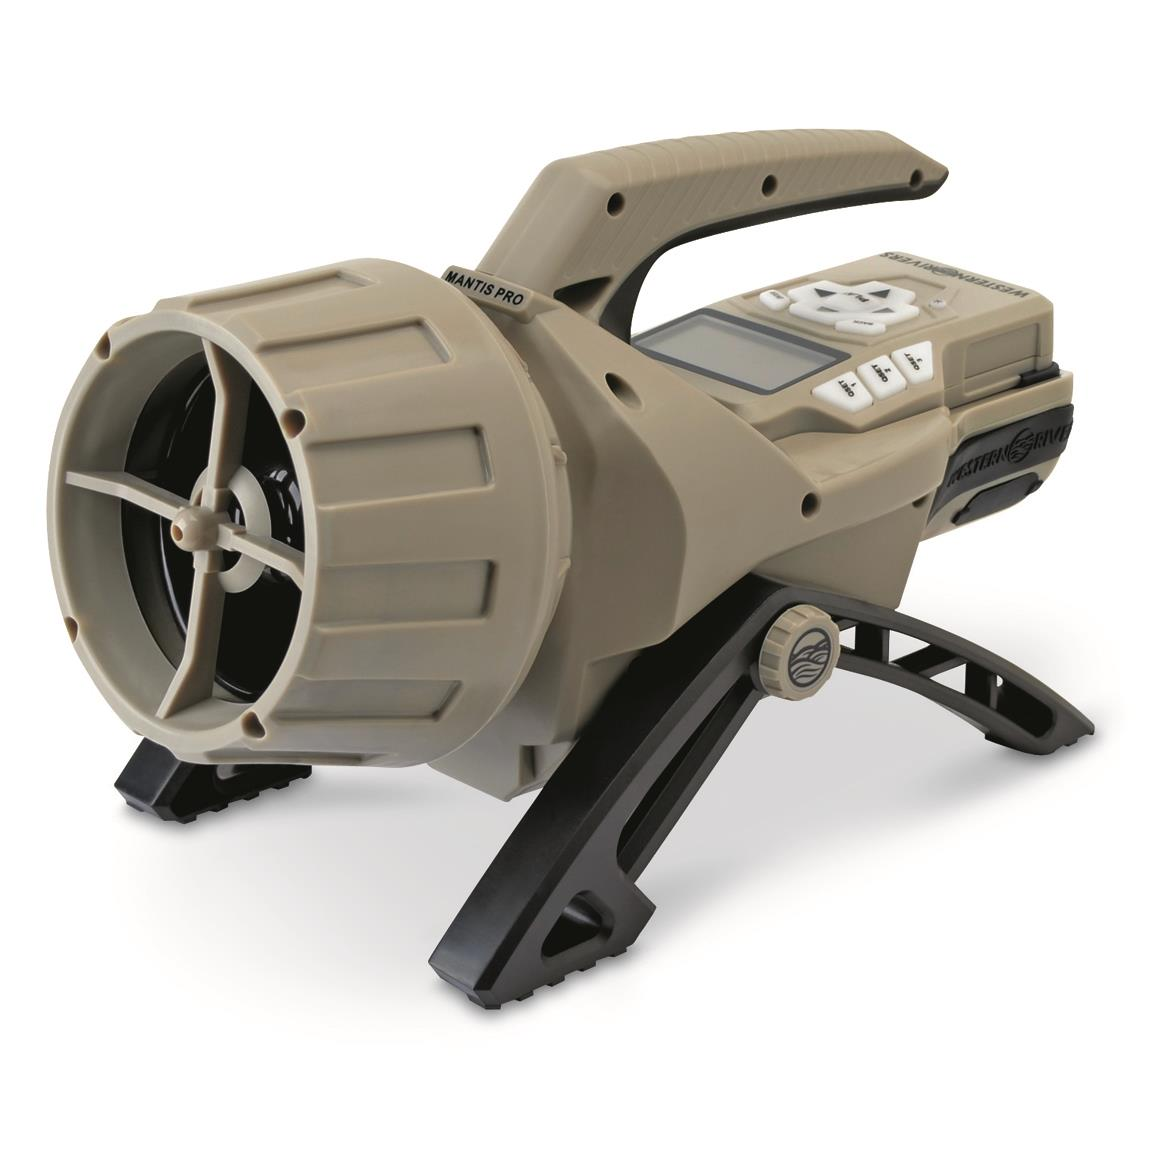 Western Rivers Electronic Caller Handheld Mantis 50 WRCGC50 for sale online